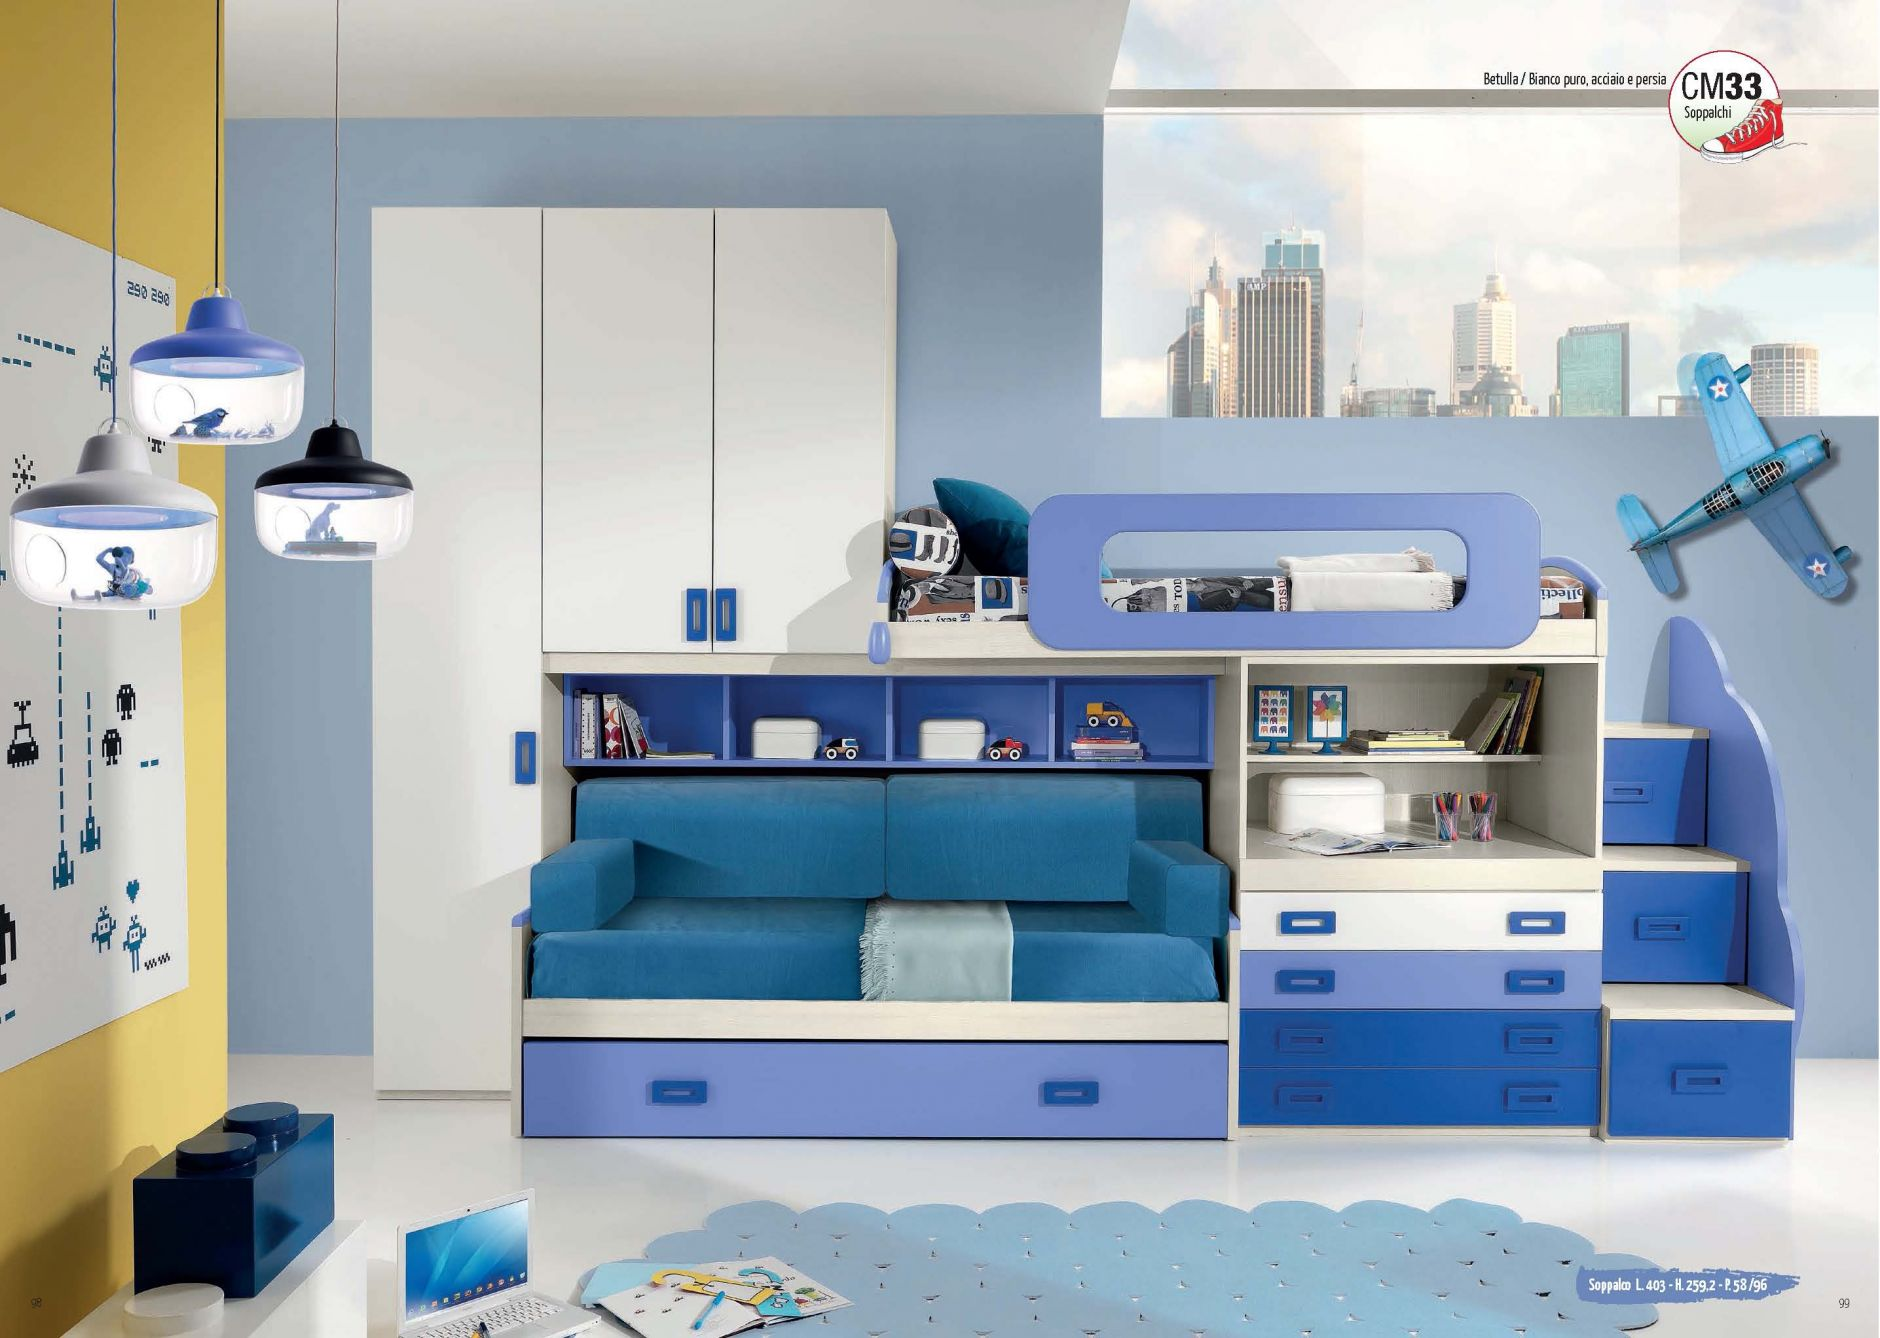 Muebles De Los Ni Os Muebles Giessegi Composici N Sm33  # Giessegi Muebles Infantil